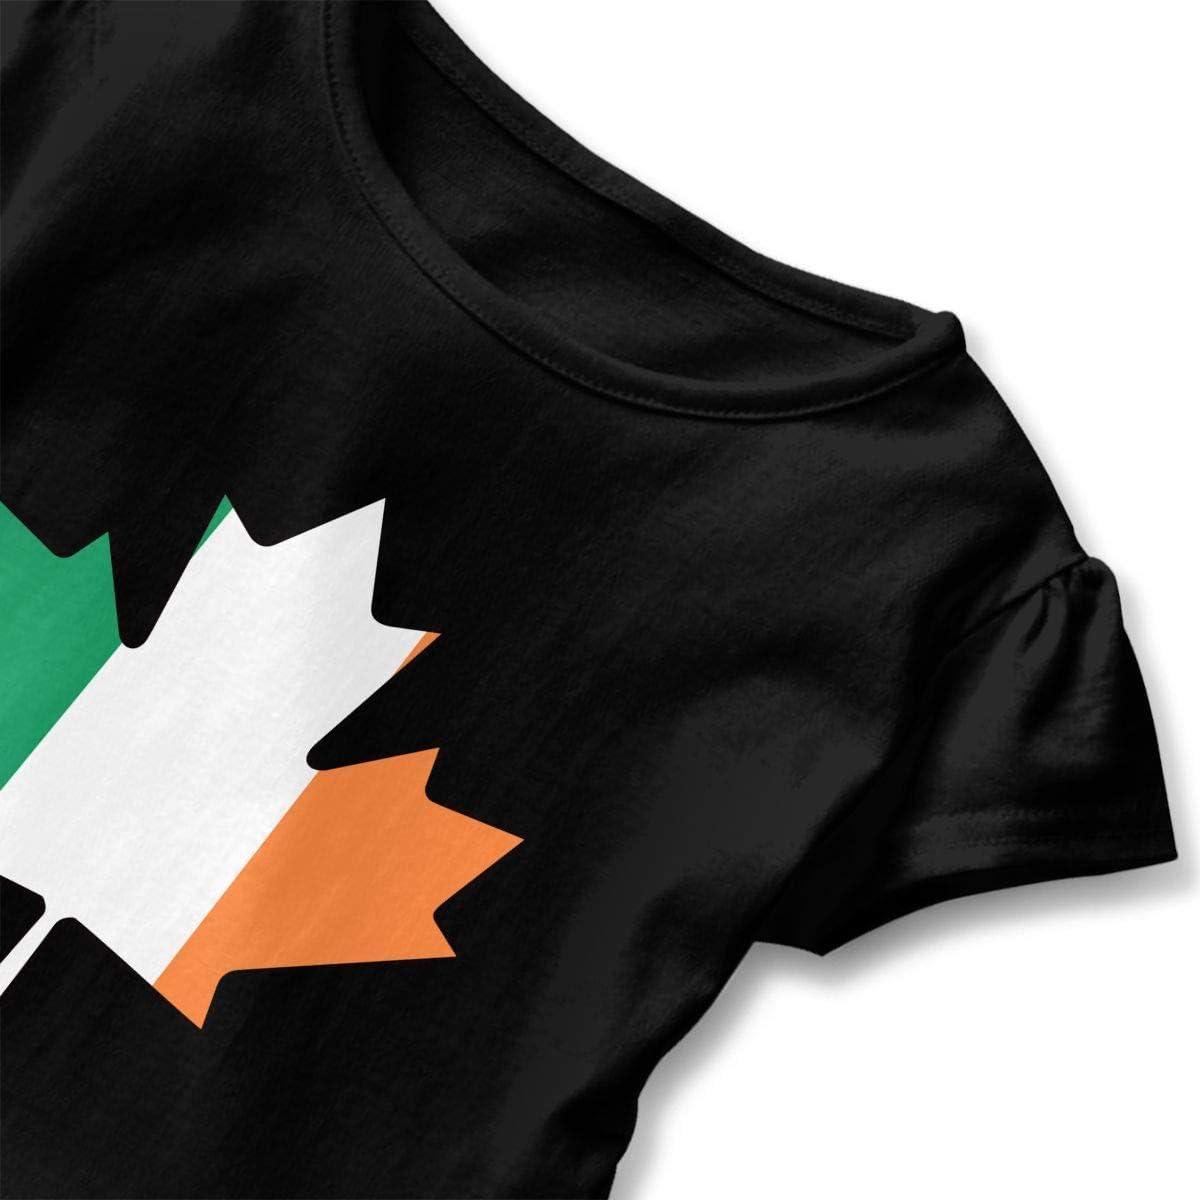 Irish Flag Canada Maple Leaf-1 T Shirts Kids Girls Short Sleeve Ruffles Shirt Tee for 2-6T